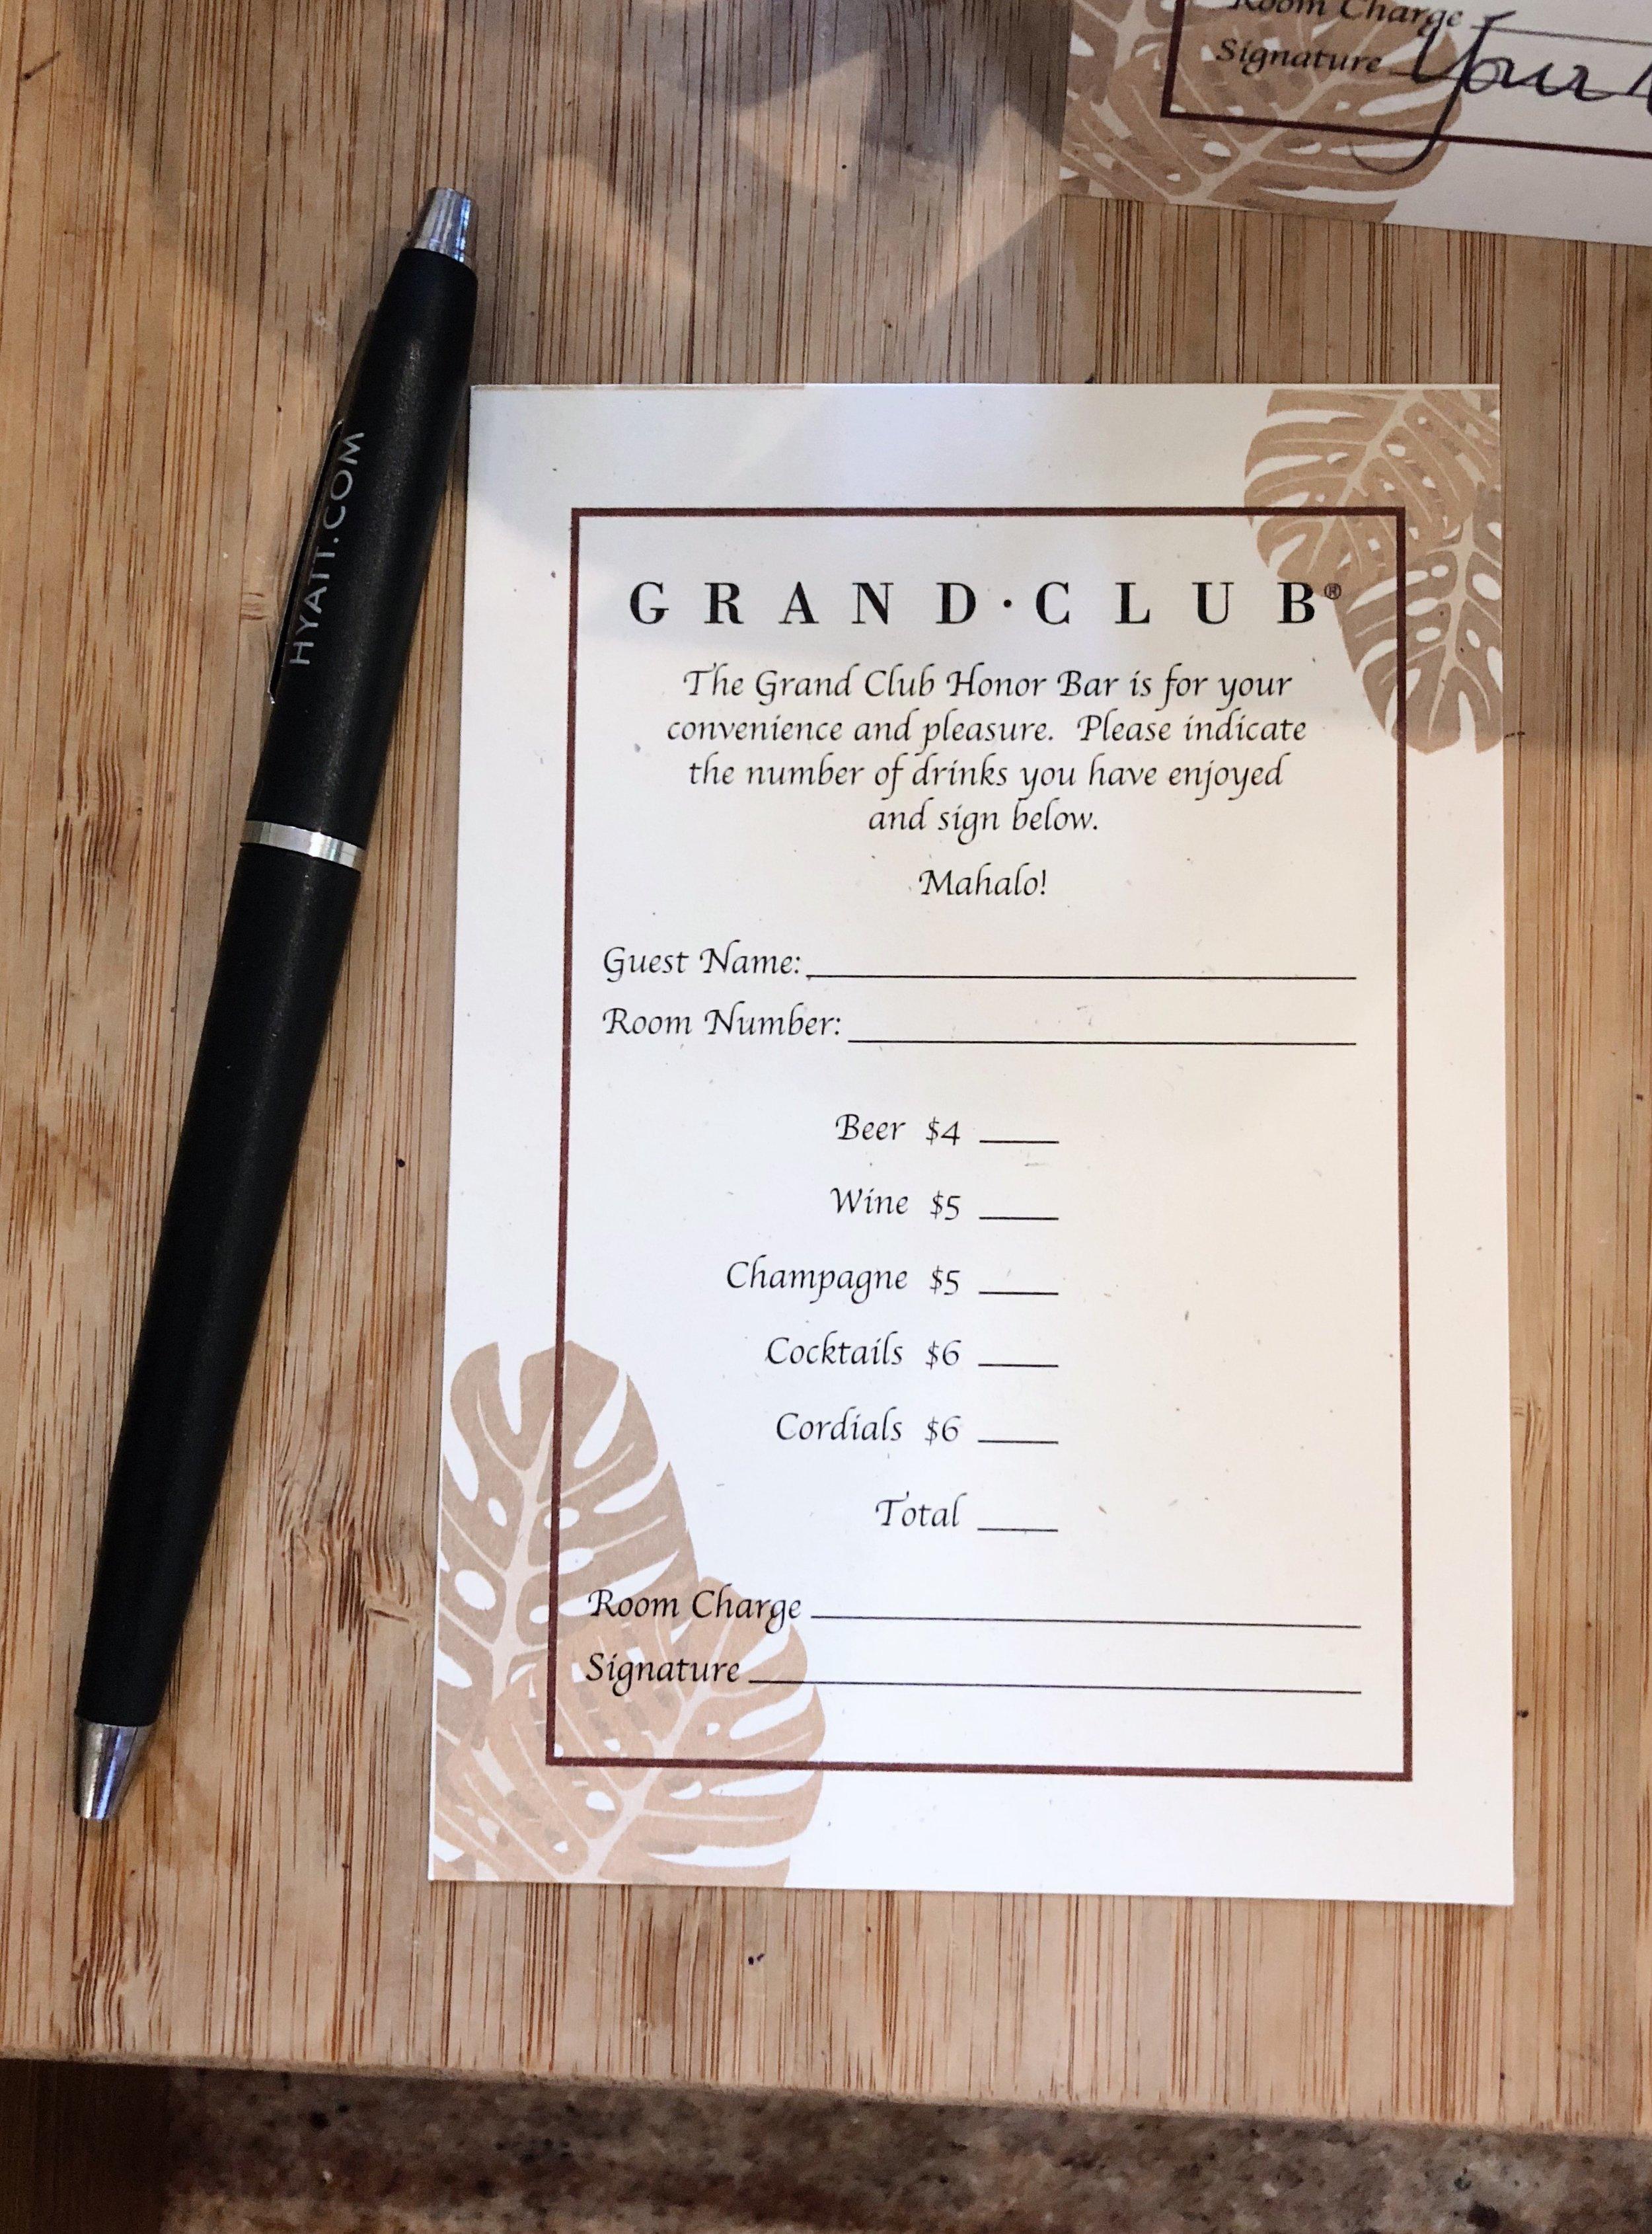 Honor bar at the Grand Hyatt Kauai's Grand Club Executive Lounge